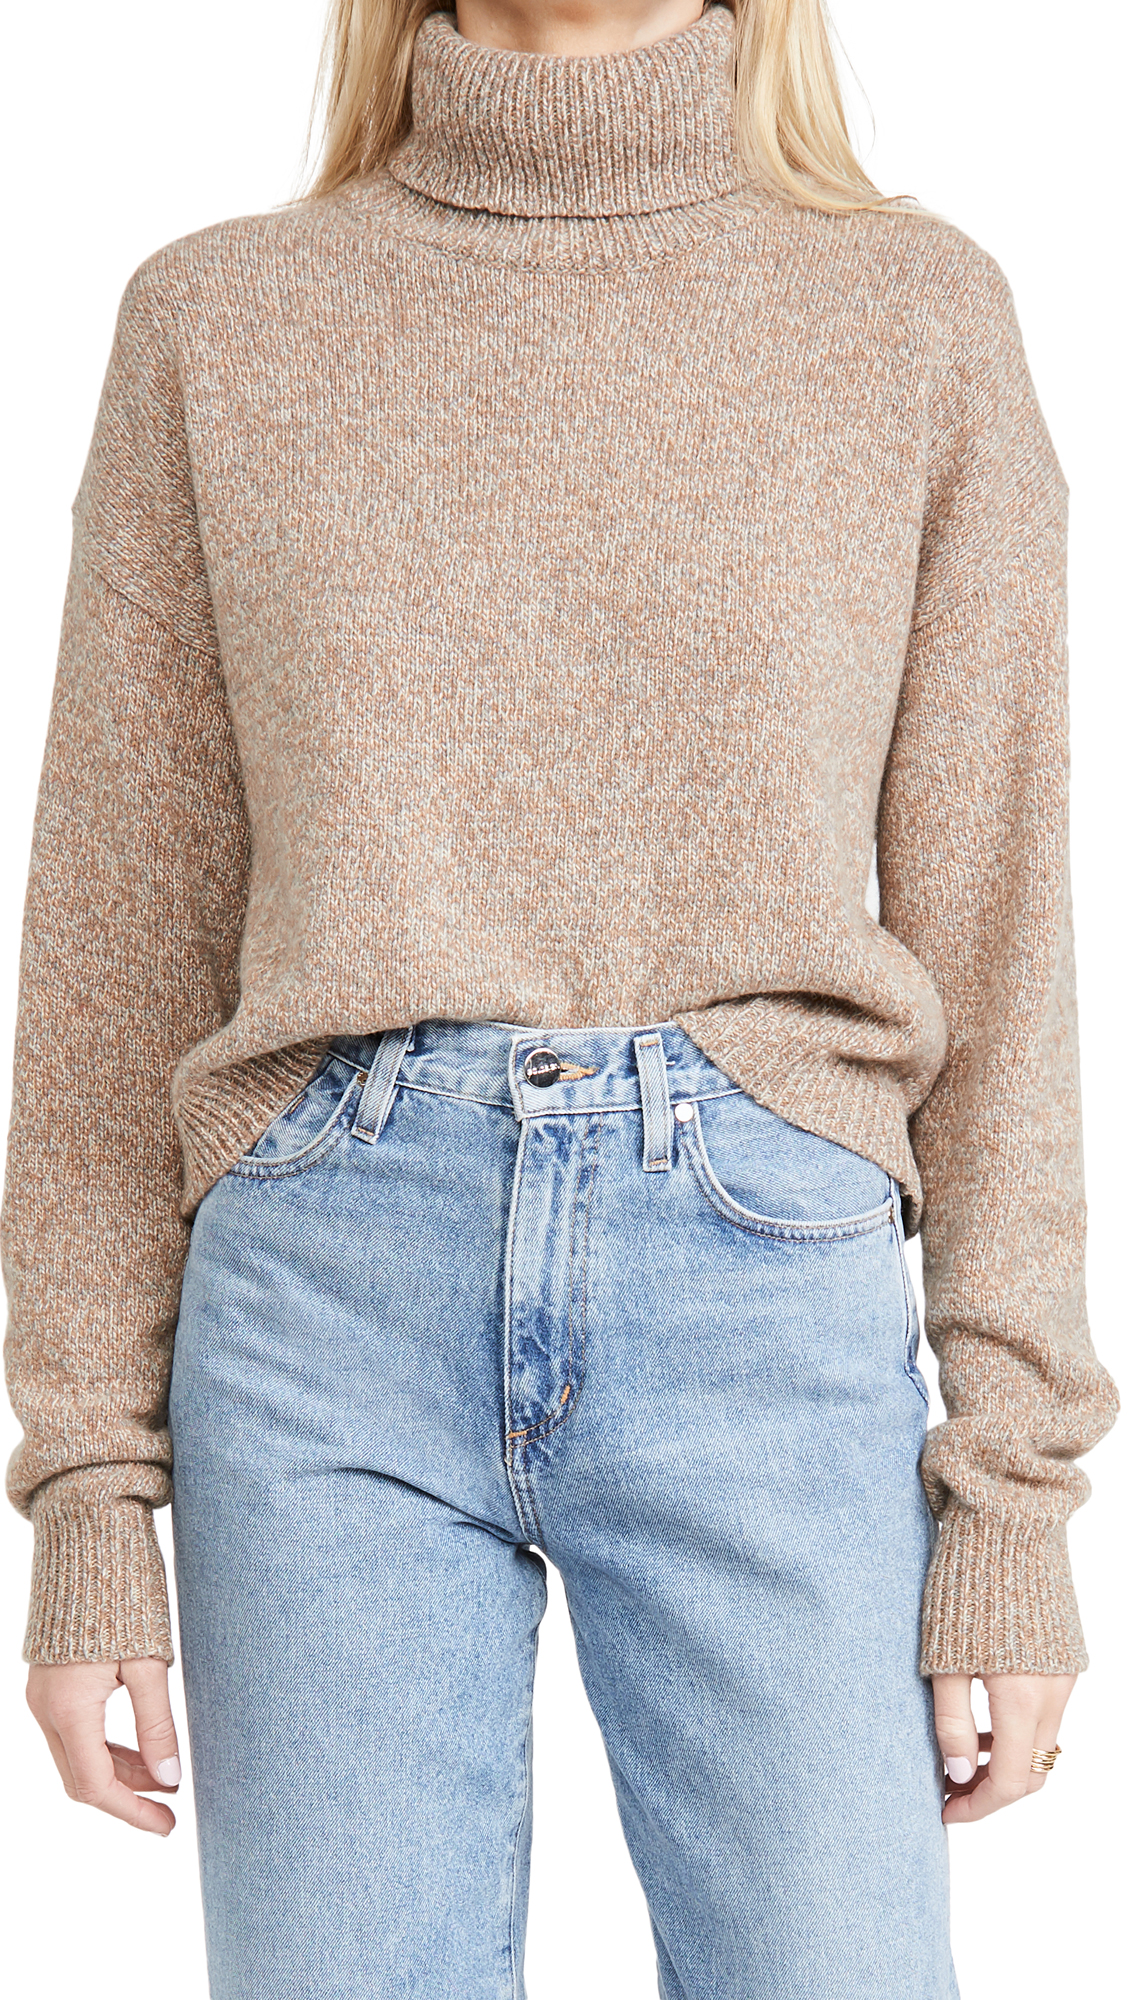 Tibi Turtleneck Cropped Pullover